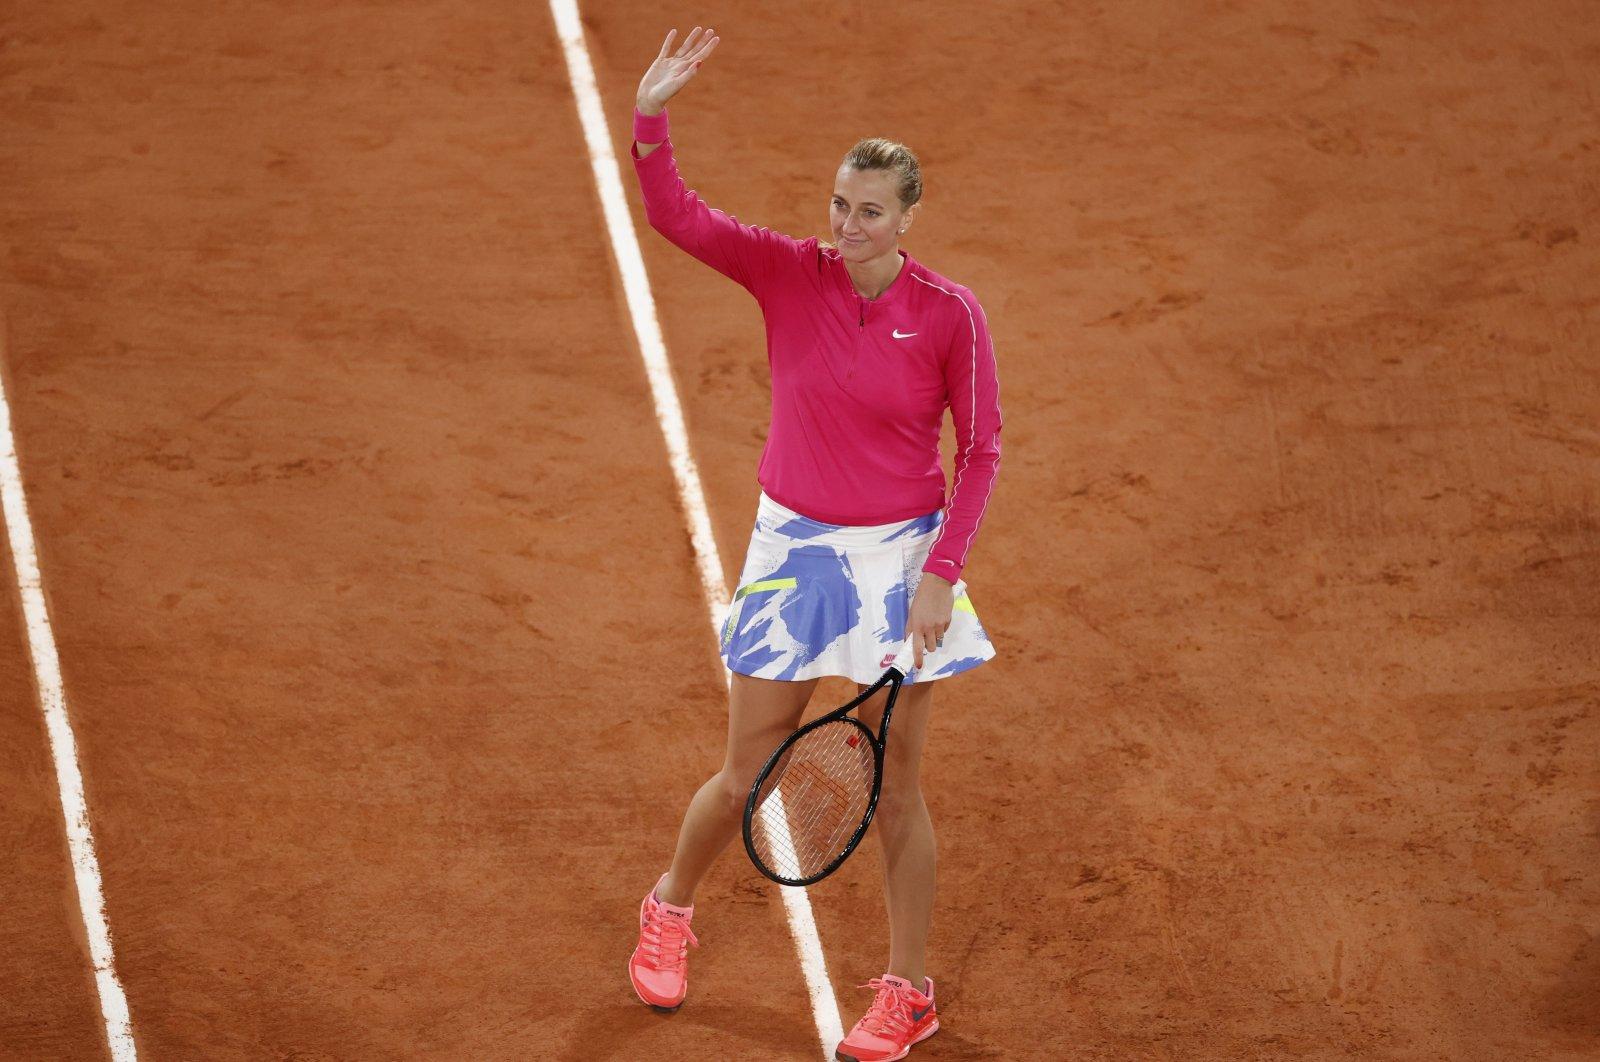 Petra Kvitova celebrates her win against Dodin, in Paris, France, Sept. 28, 2020. (Reuters Photo)